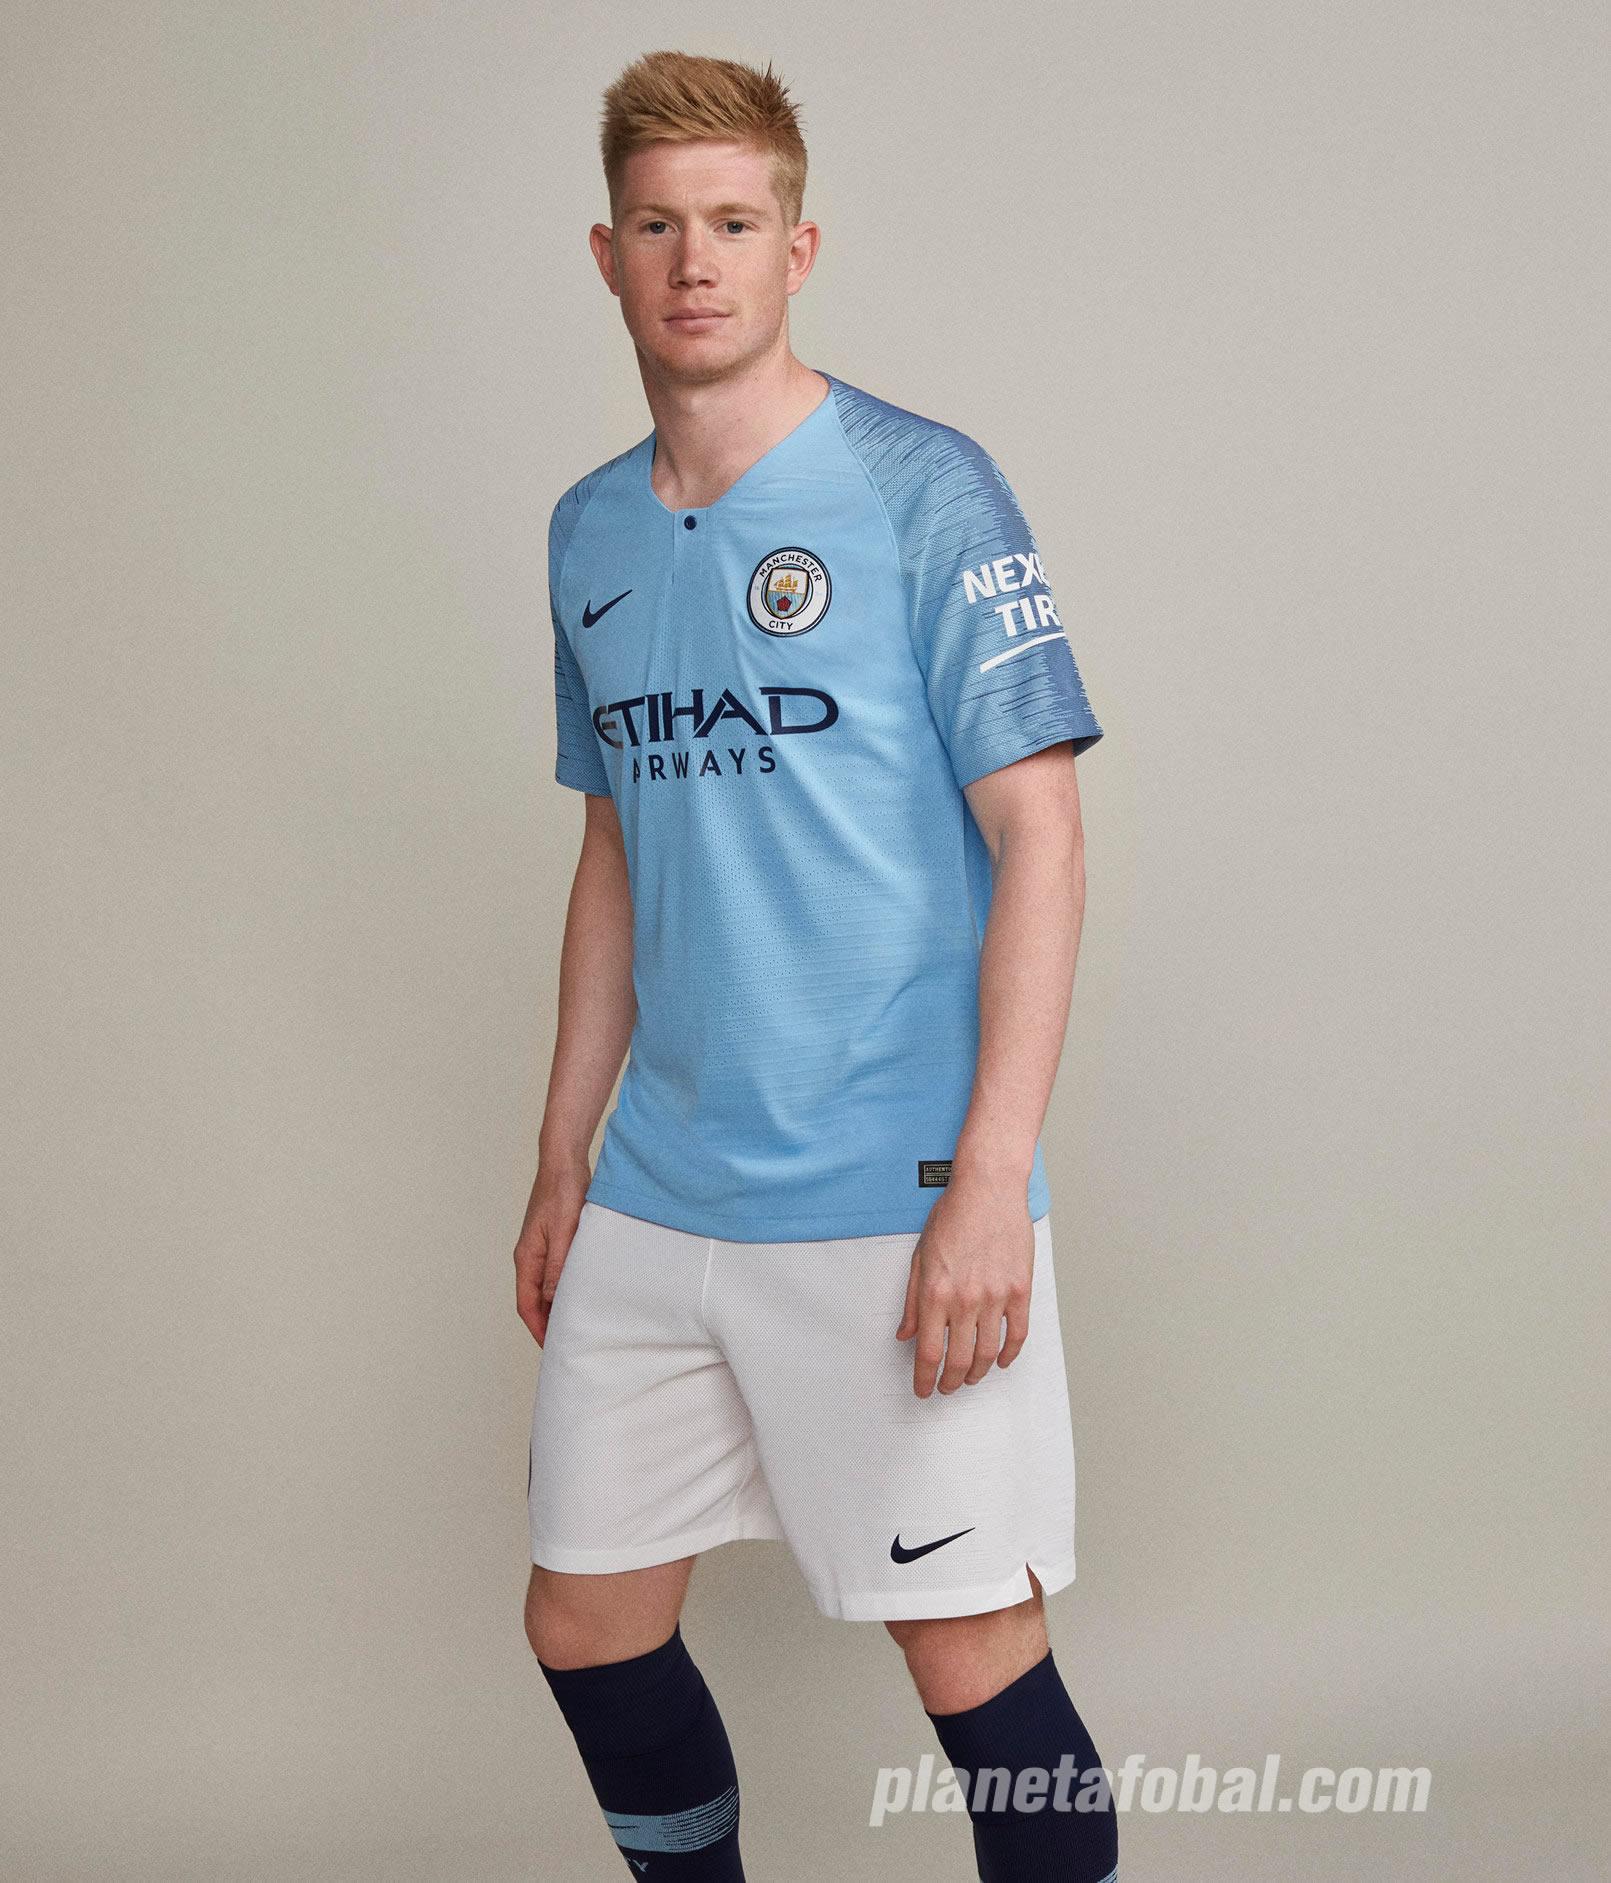 Camiseta Nike del Manchester City 2018/2019